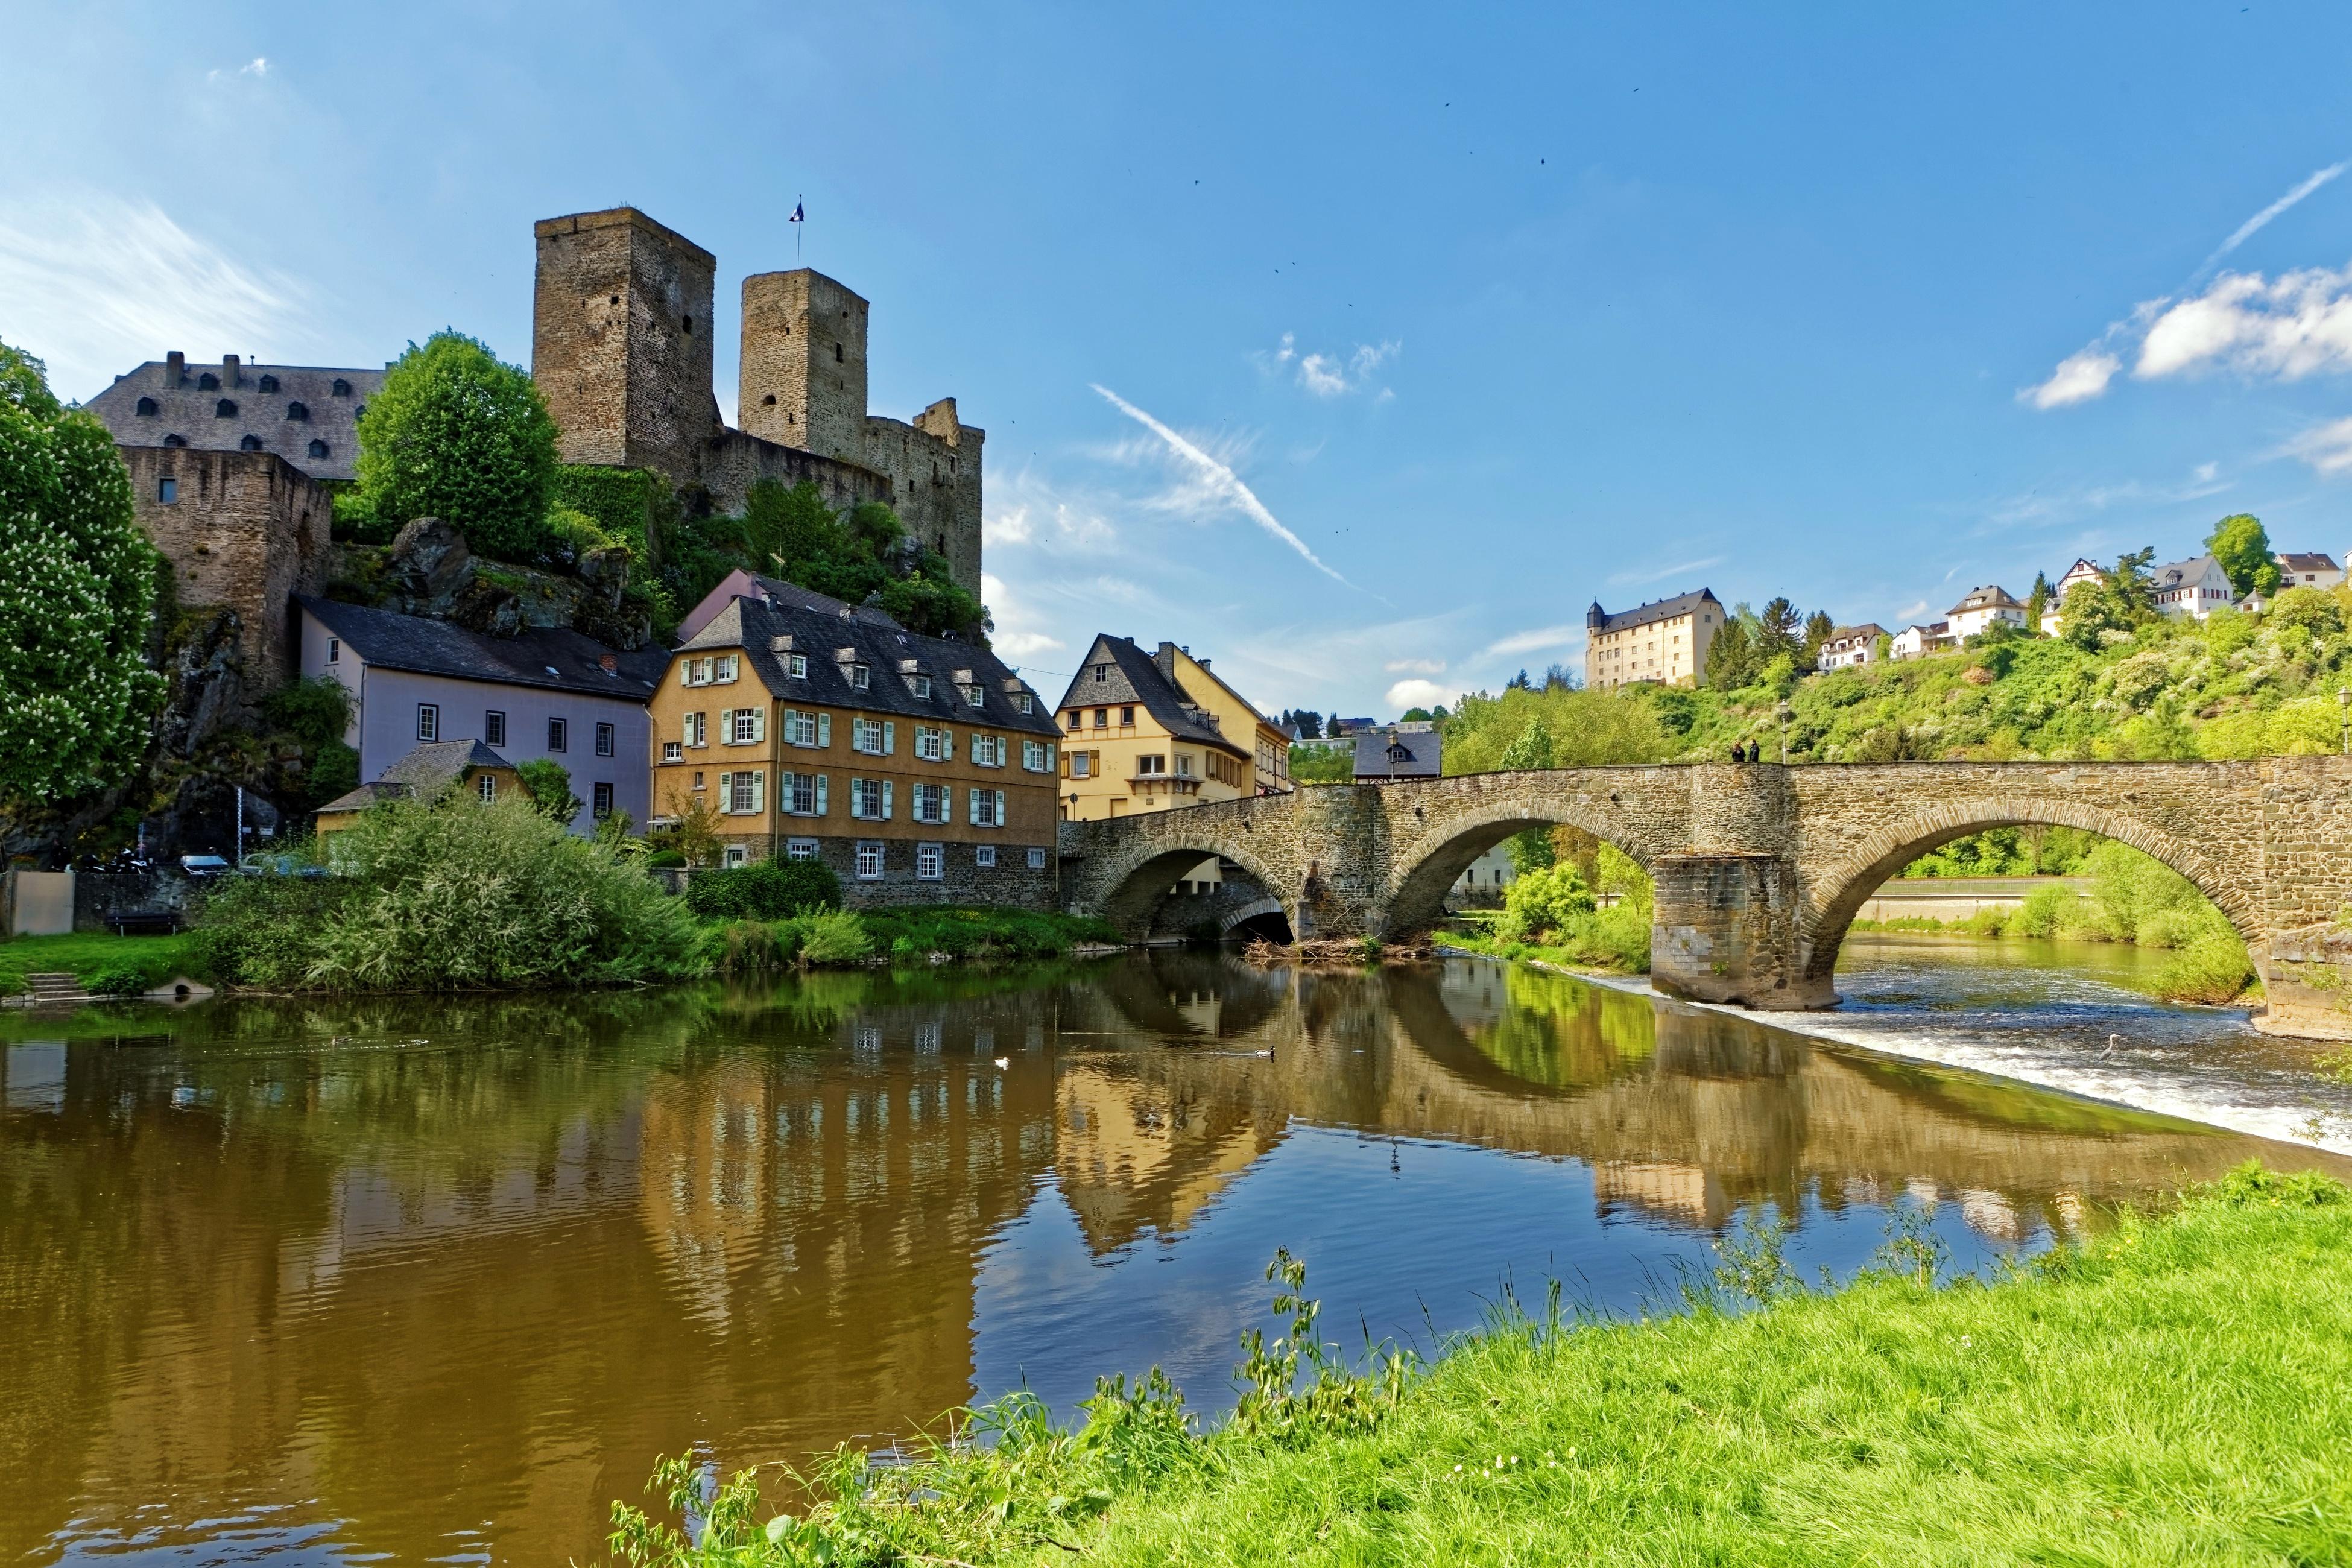 Lorch Village, Hesse, Rhine River, Germany  № 78233  скачать